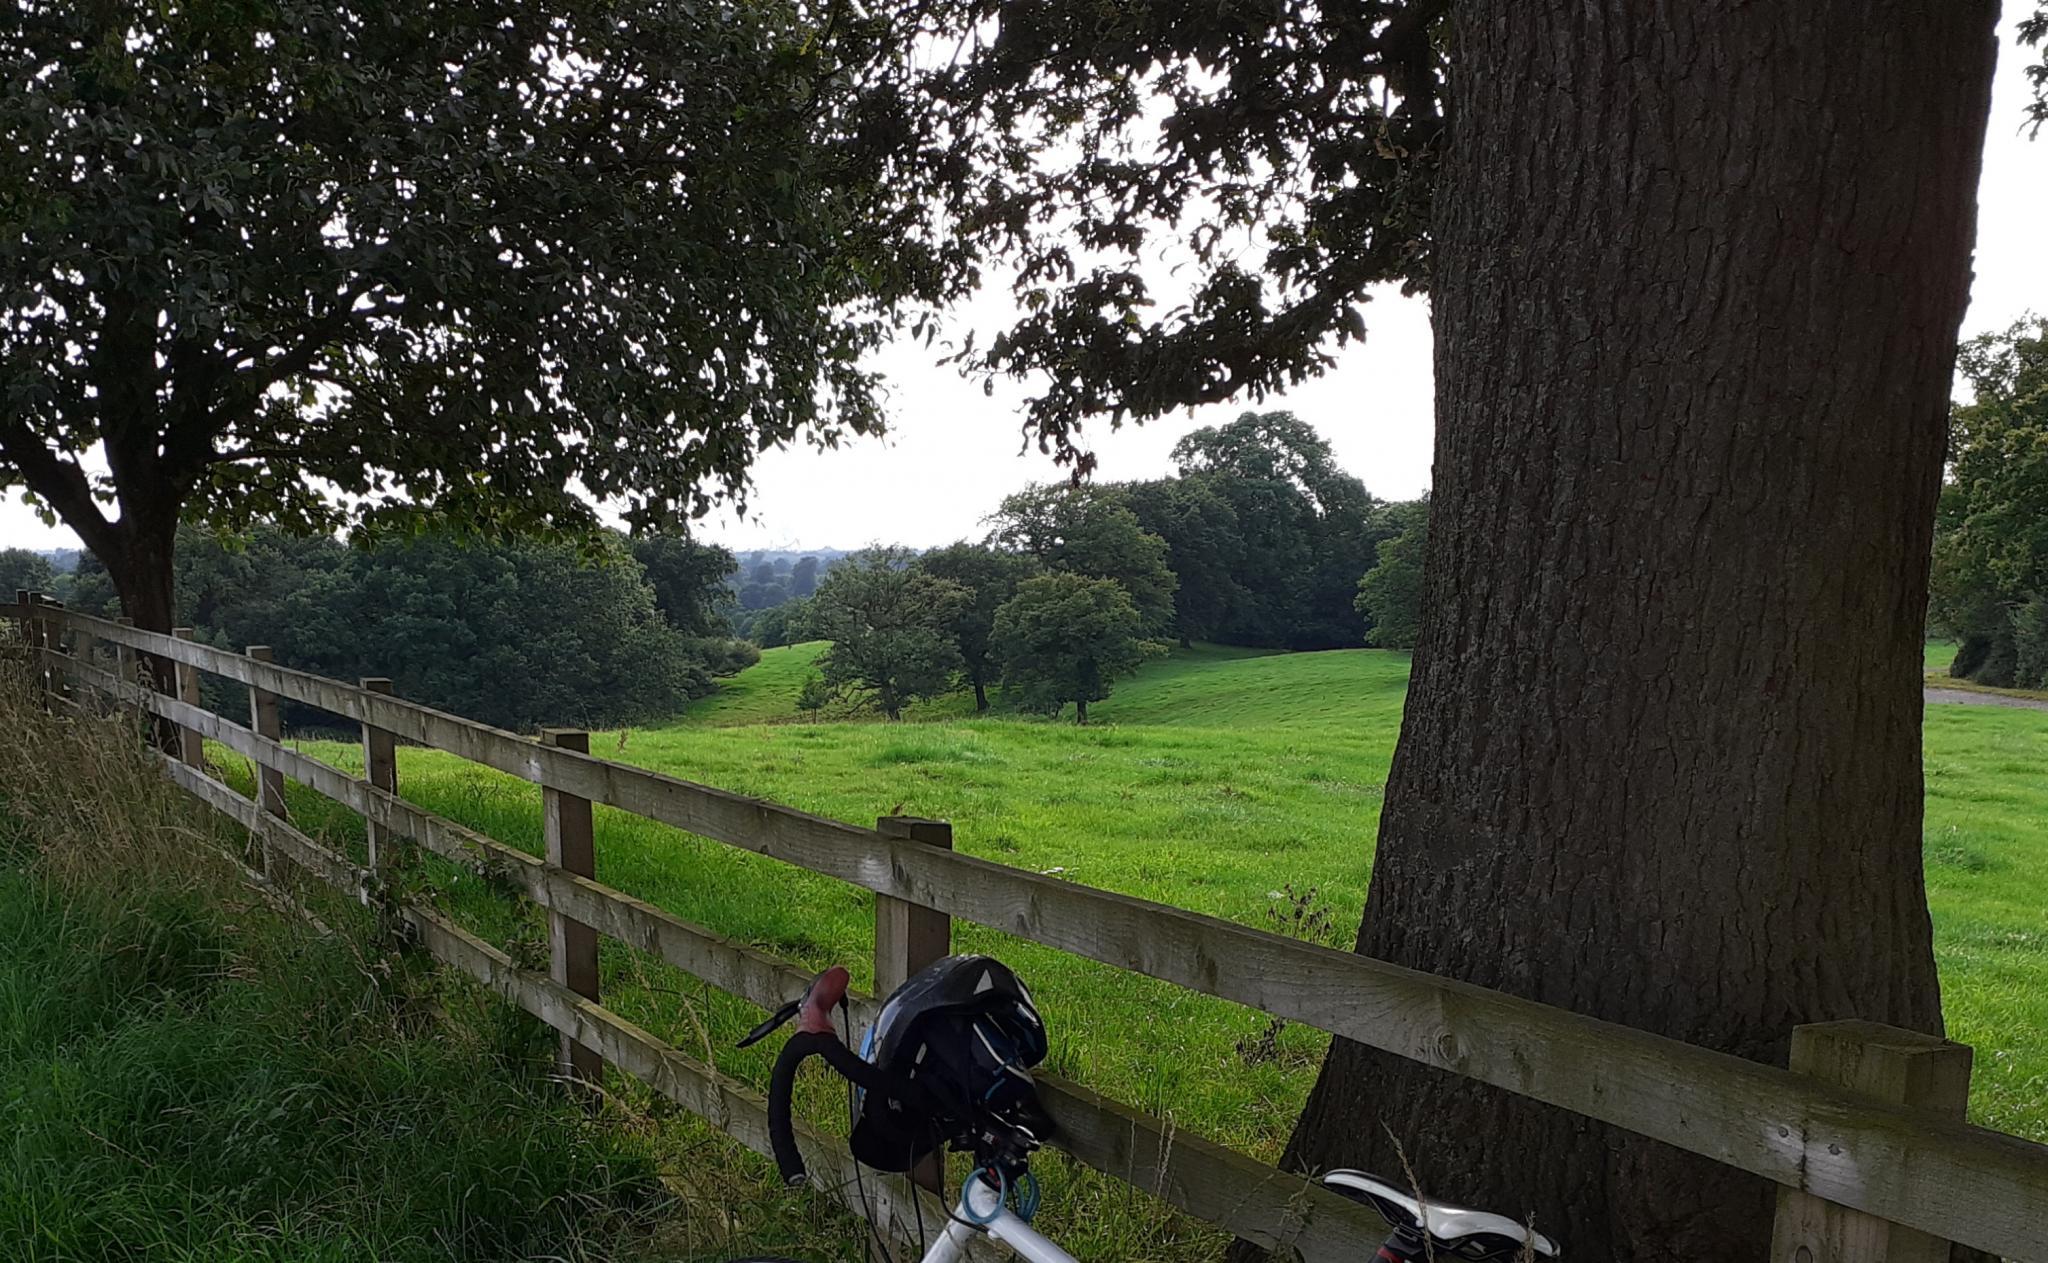 On my bike-20210803_143528-jpg